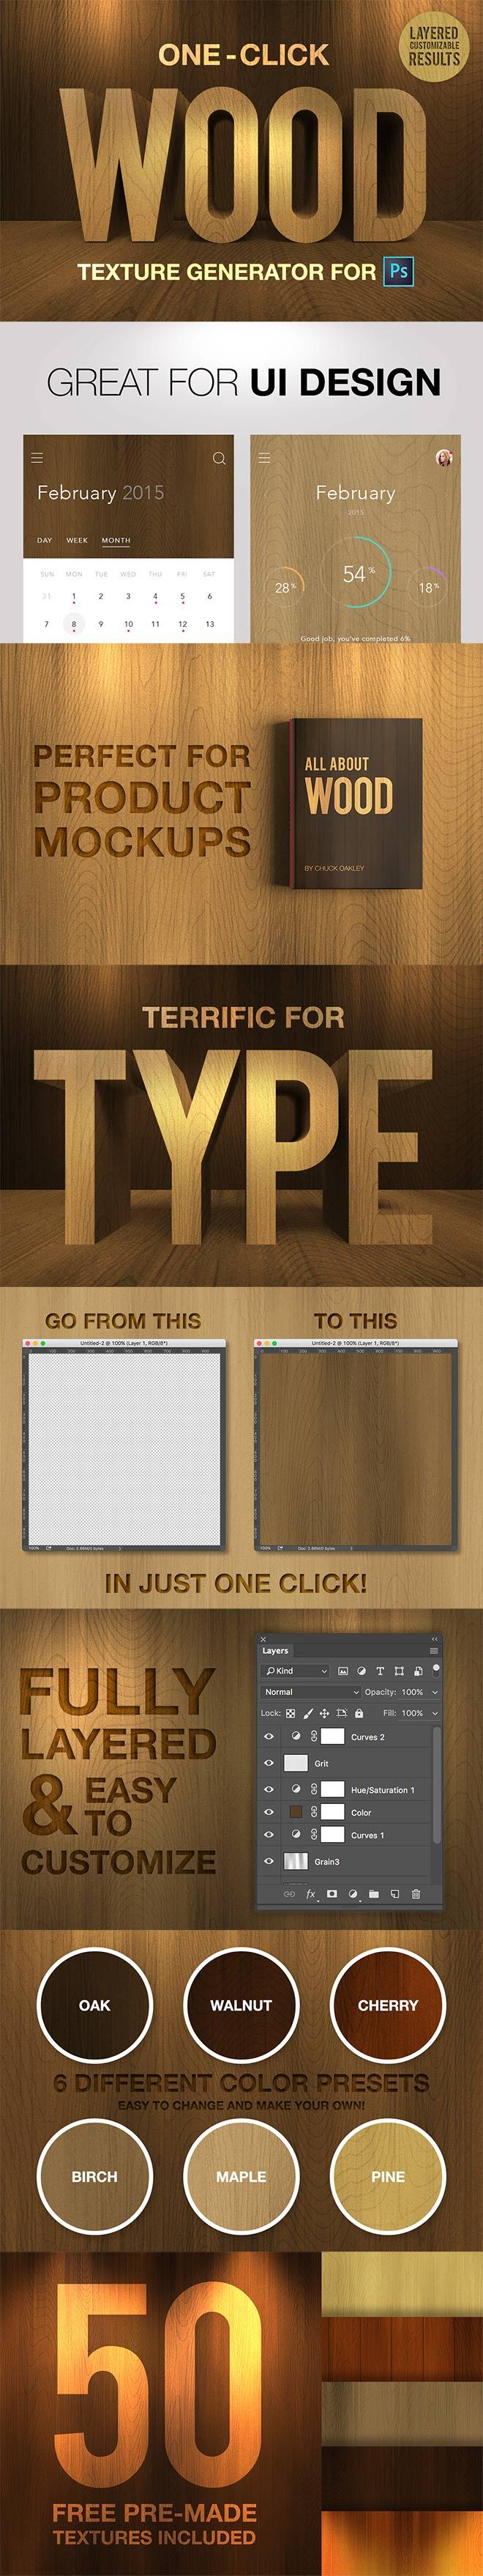 On Click Wood Texture Generator